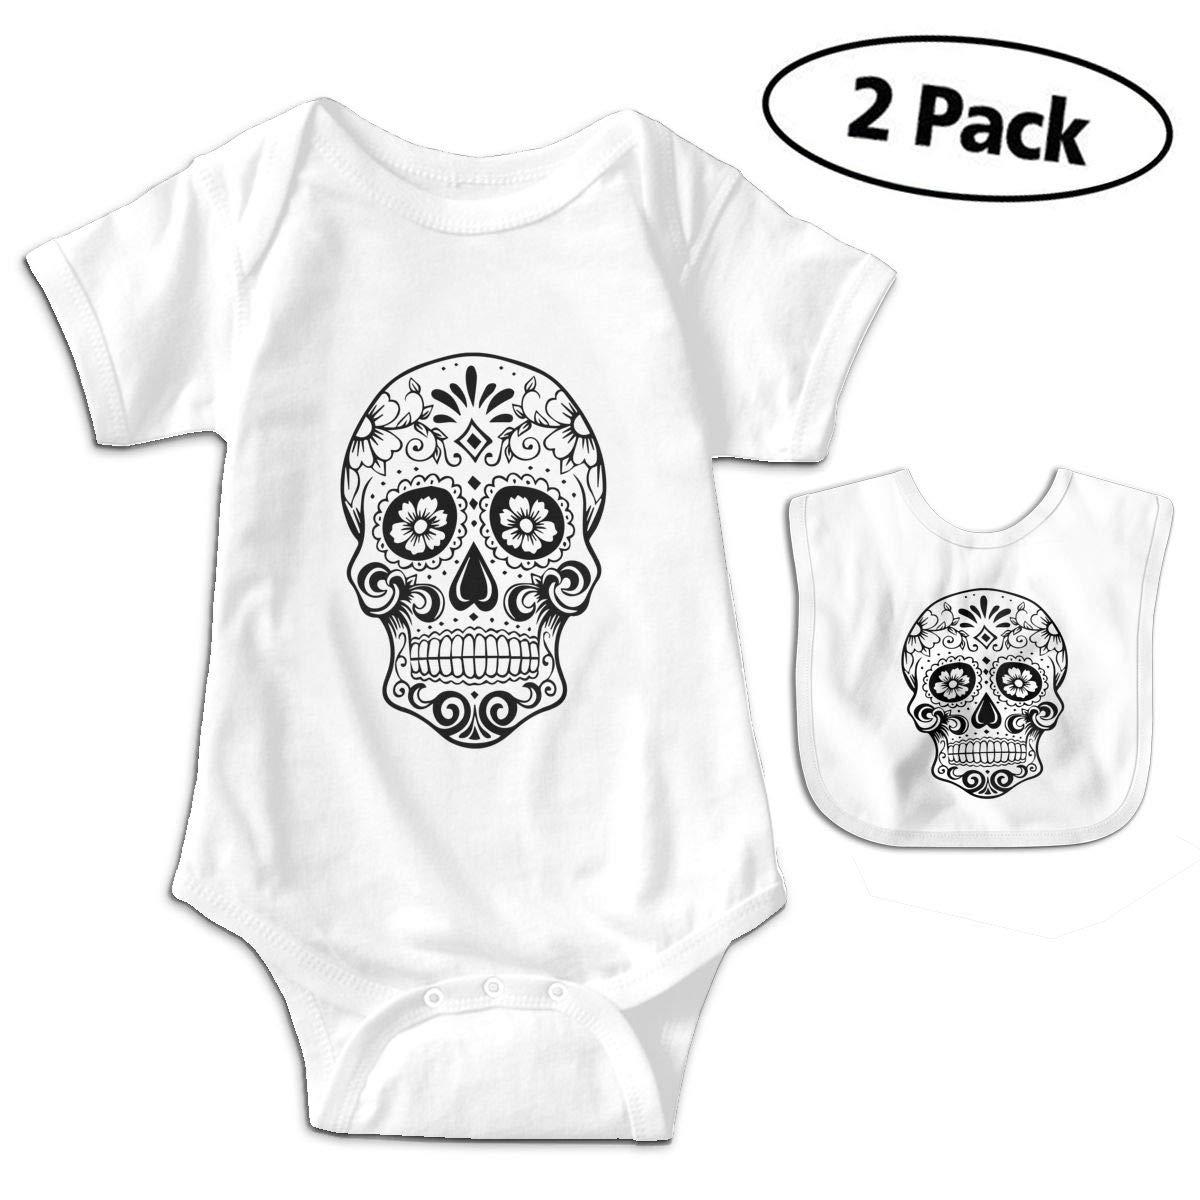 Black /& White Sugar Skull Infant Baby Boys Girls Short Sleeve Romper Bodysuit Outfit Clothes